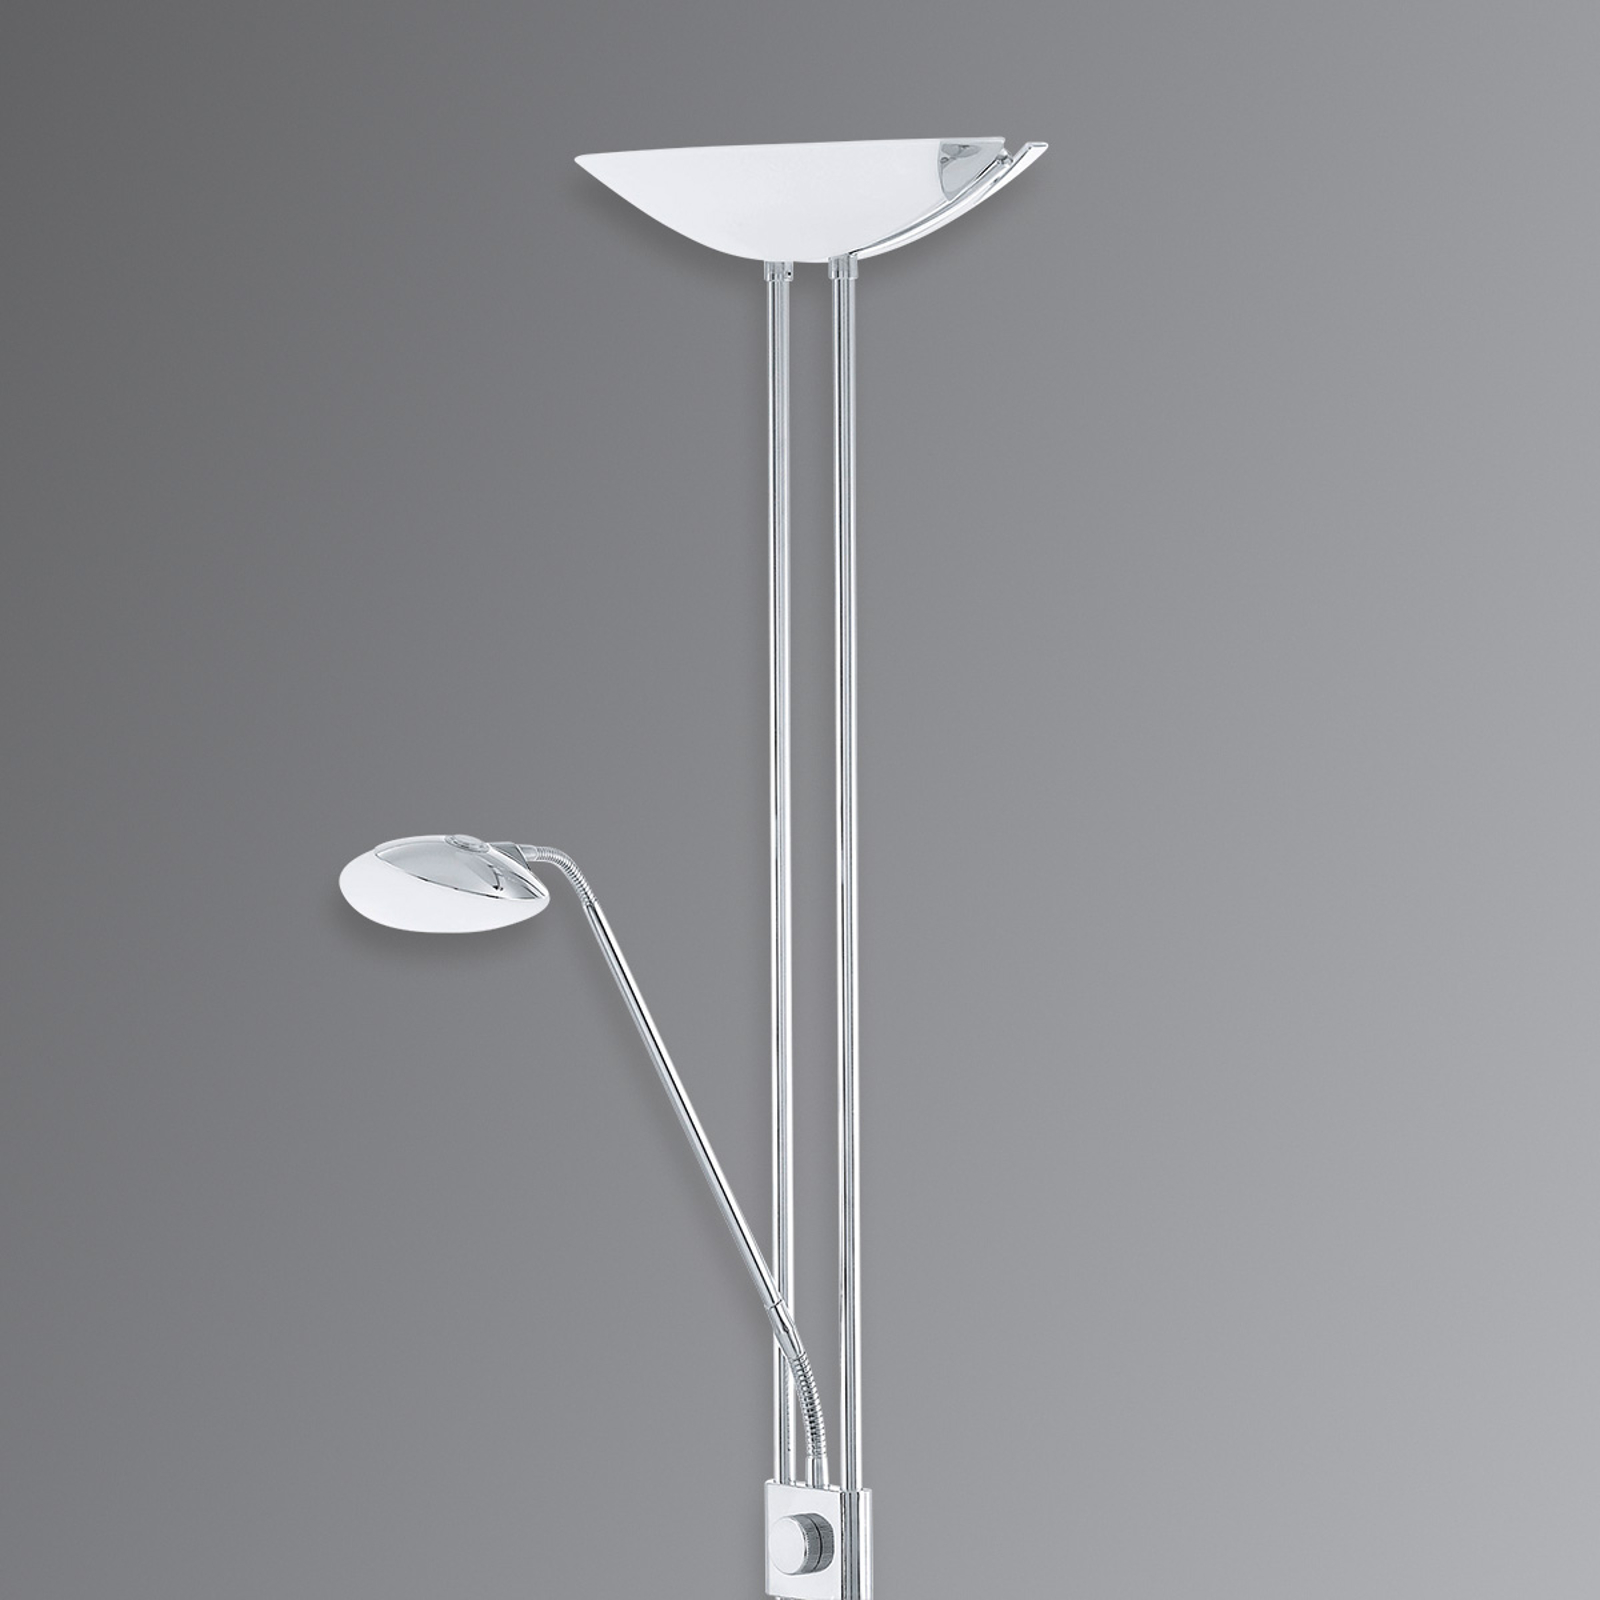 Baya – lampa LED na sufit, z lampką do czytania